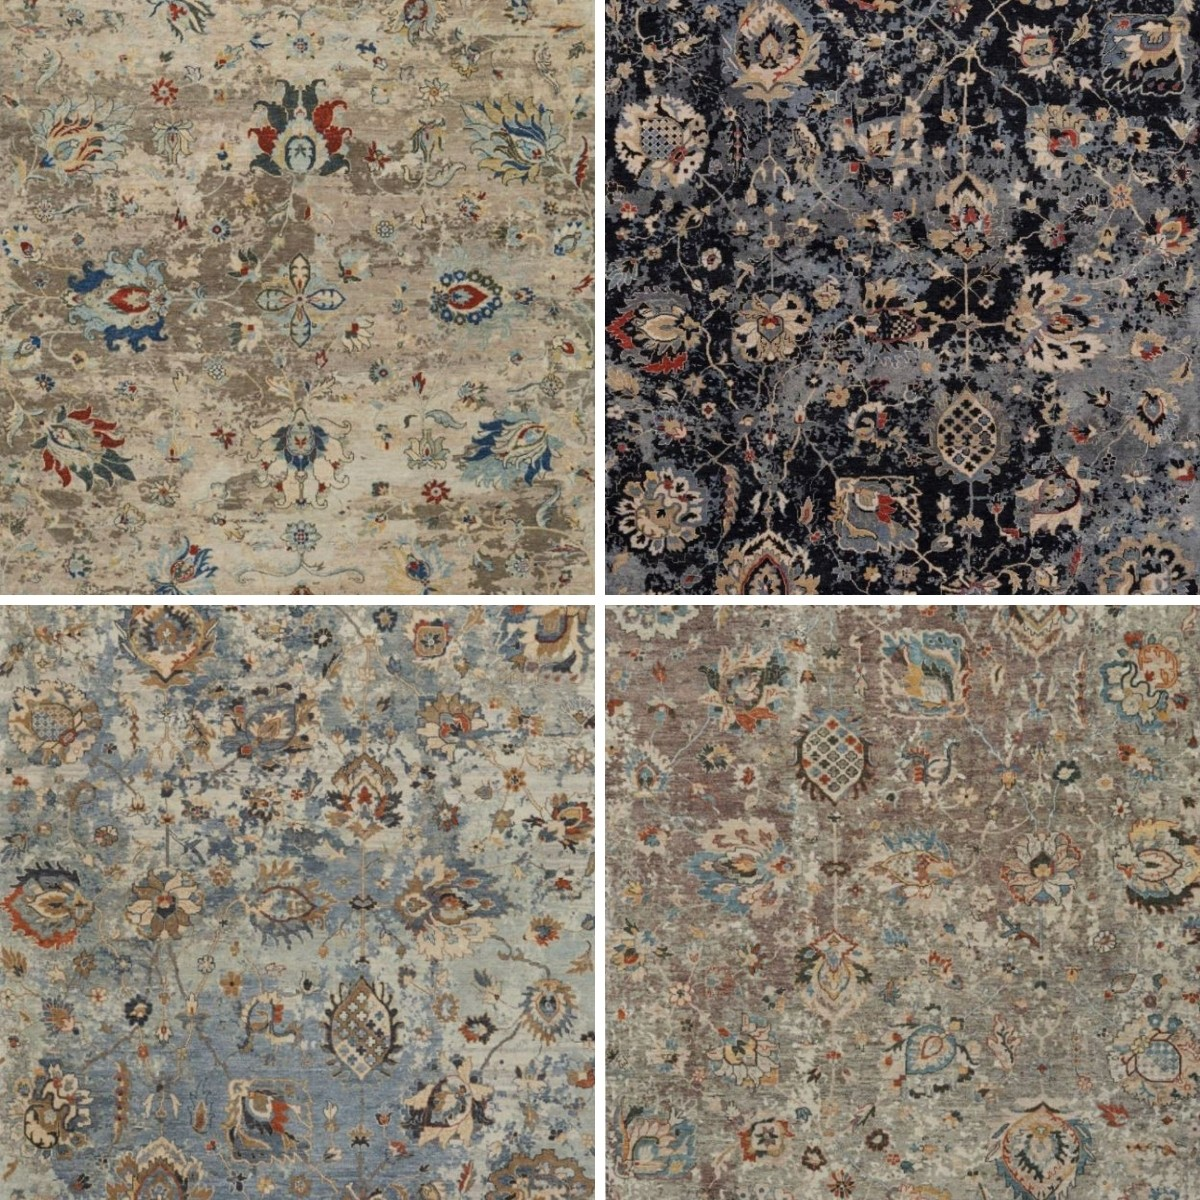 capel marmara rugs   The Carpet Shoppe